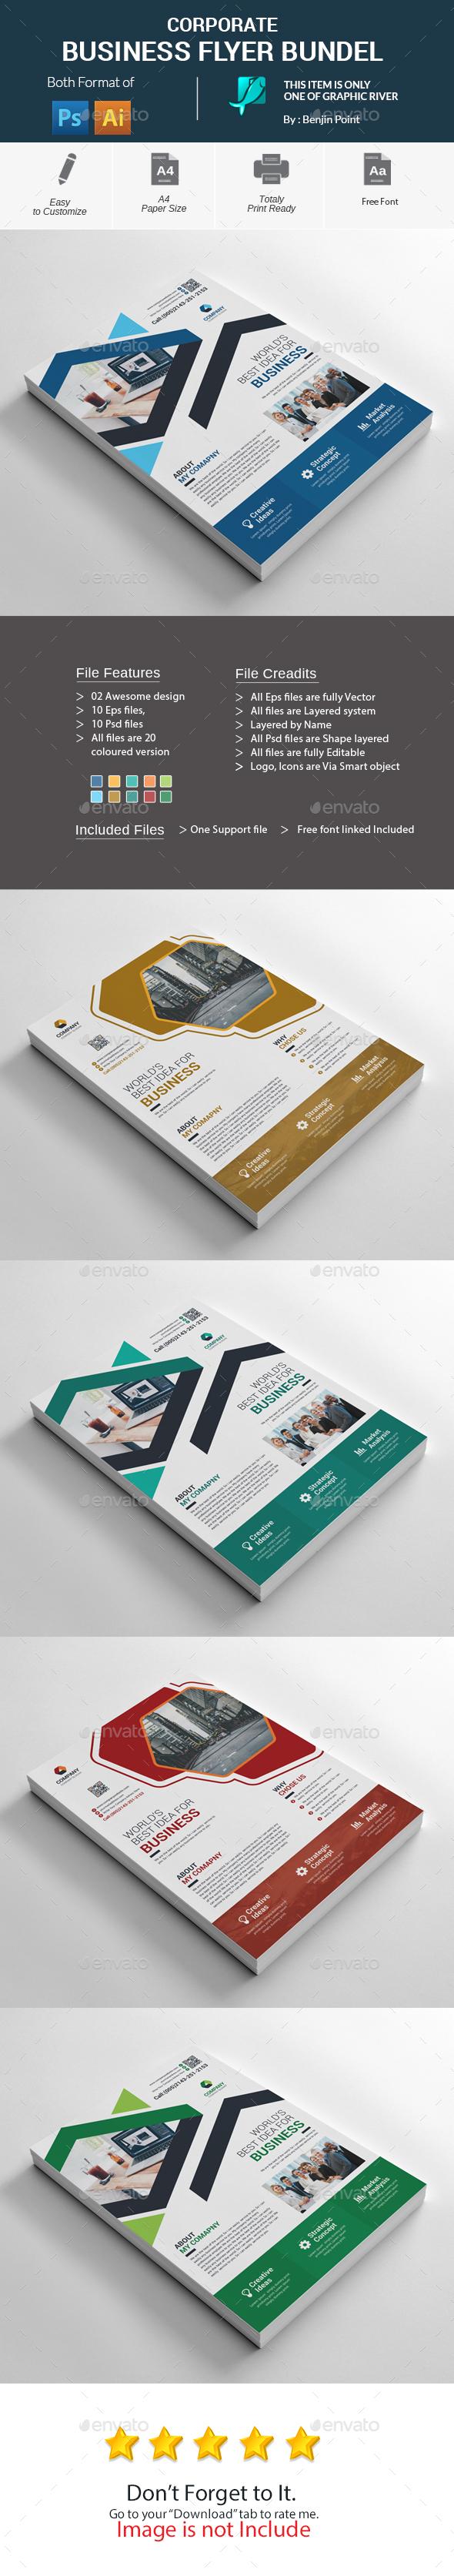 GraphicRiver Corporate Business Flyer Bundle 20824336